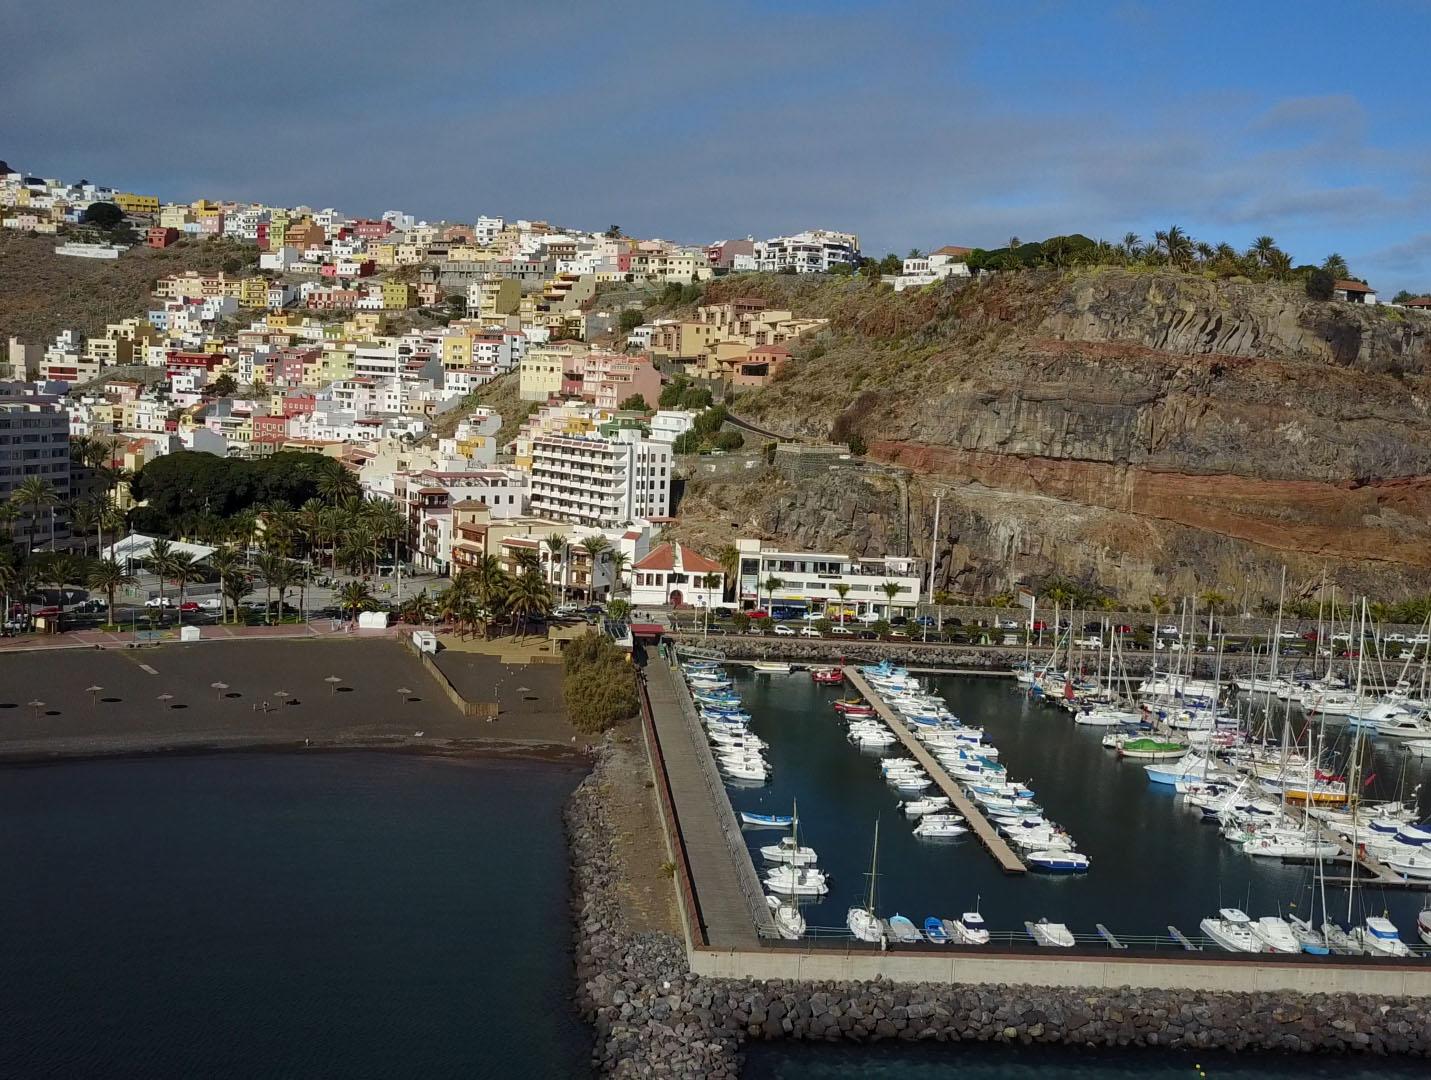 Marina La Gomera - San Sebastian: Exploring a new Island